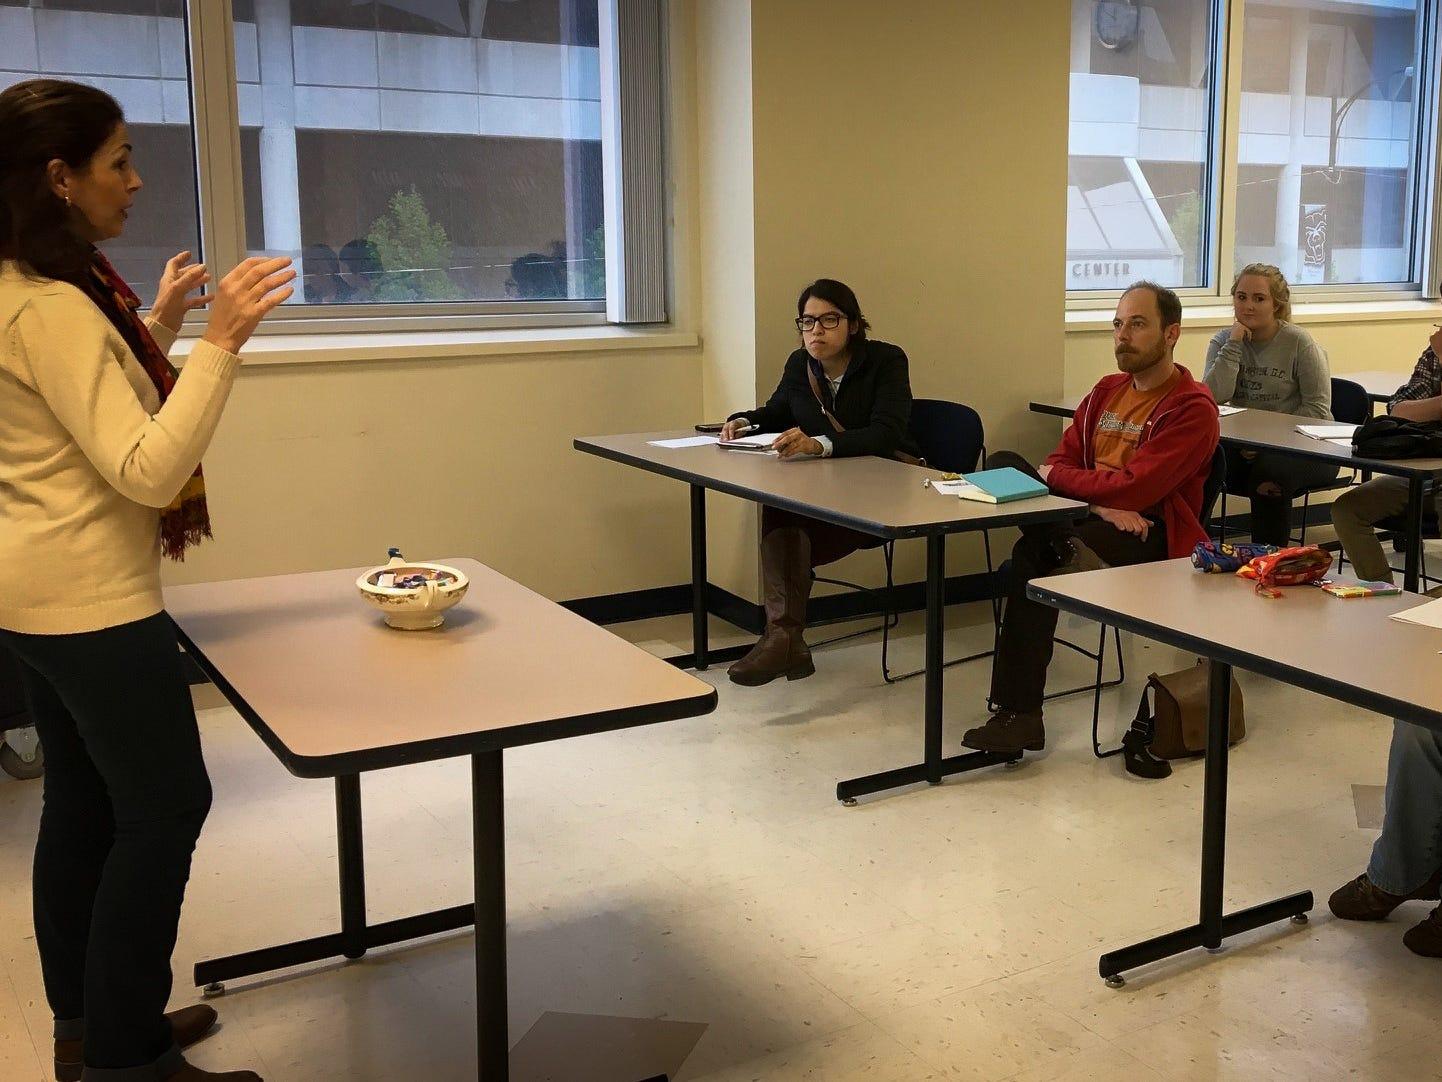 Georget Salloum teaches Arabic to students.